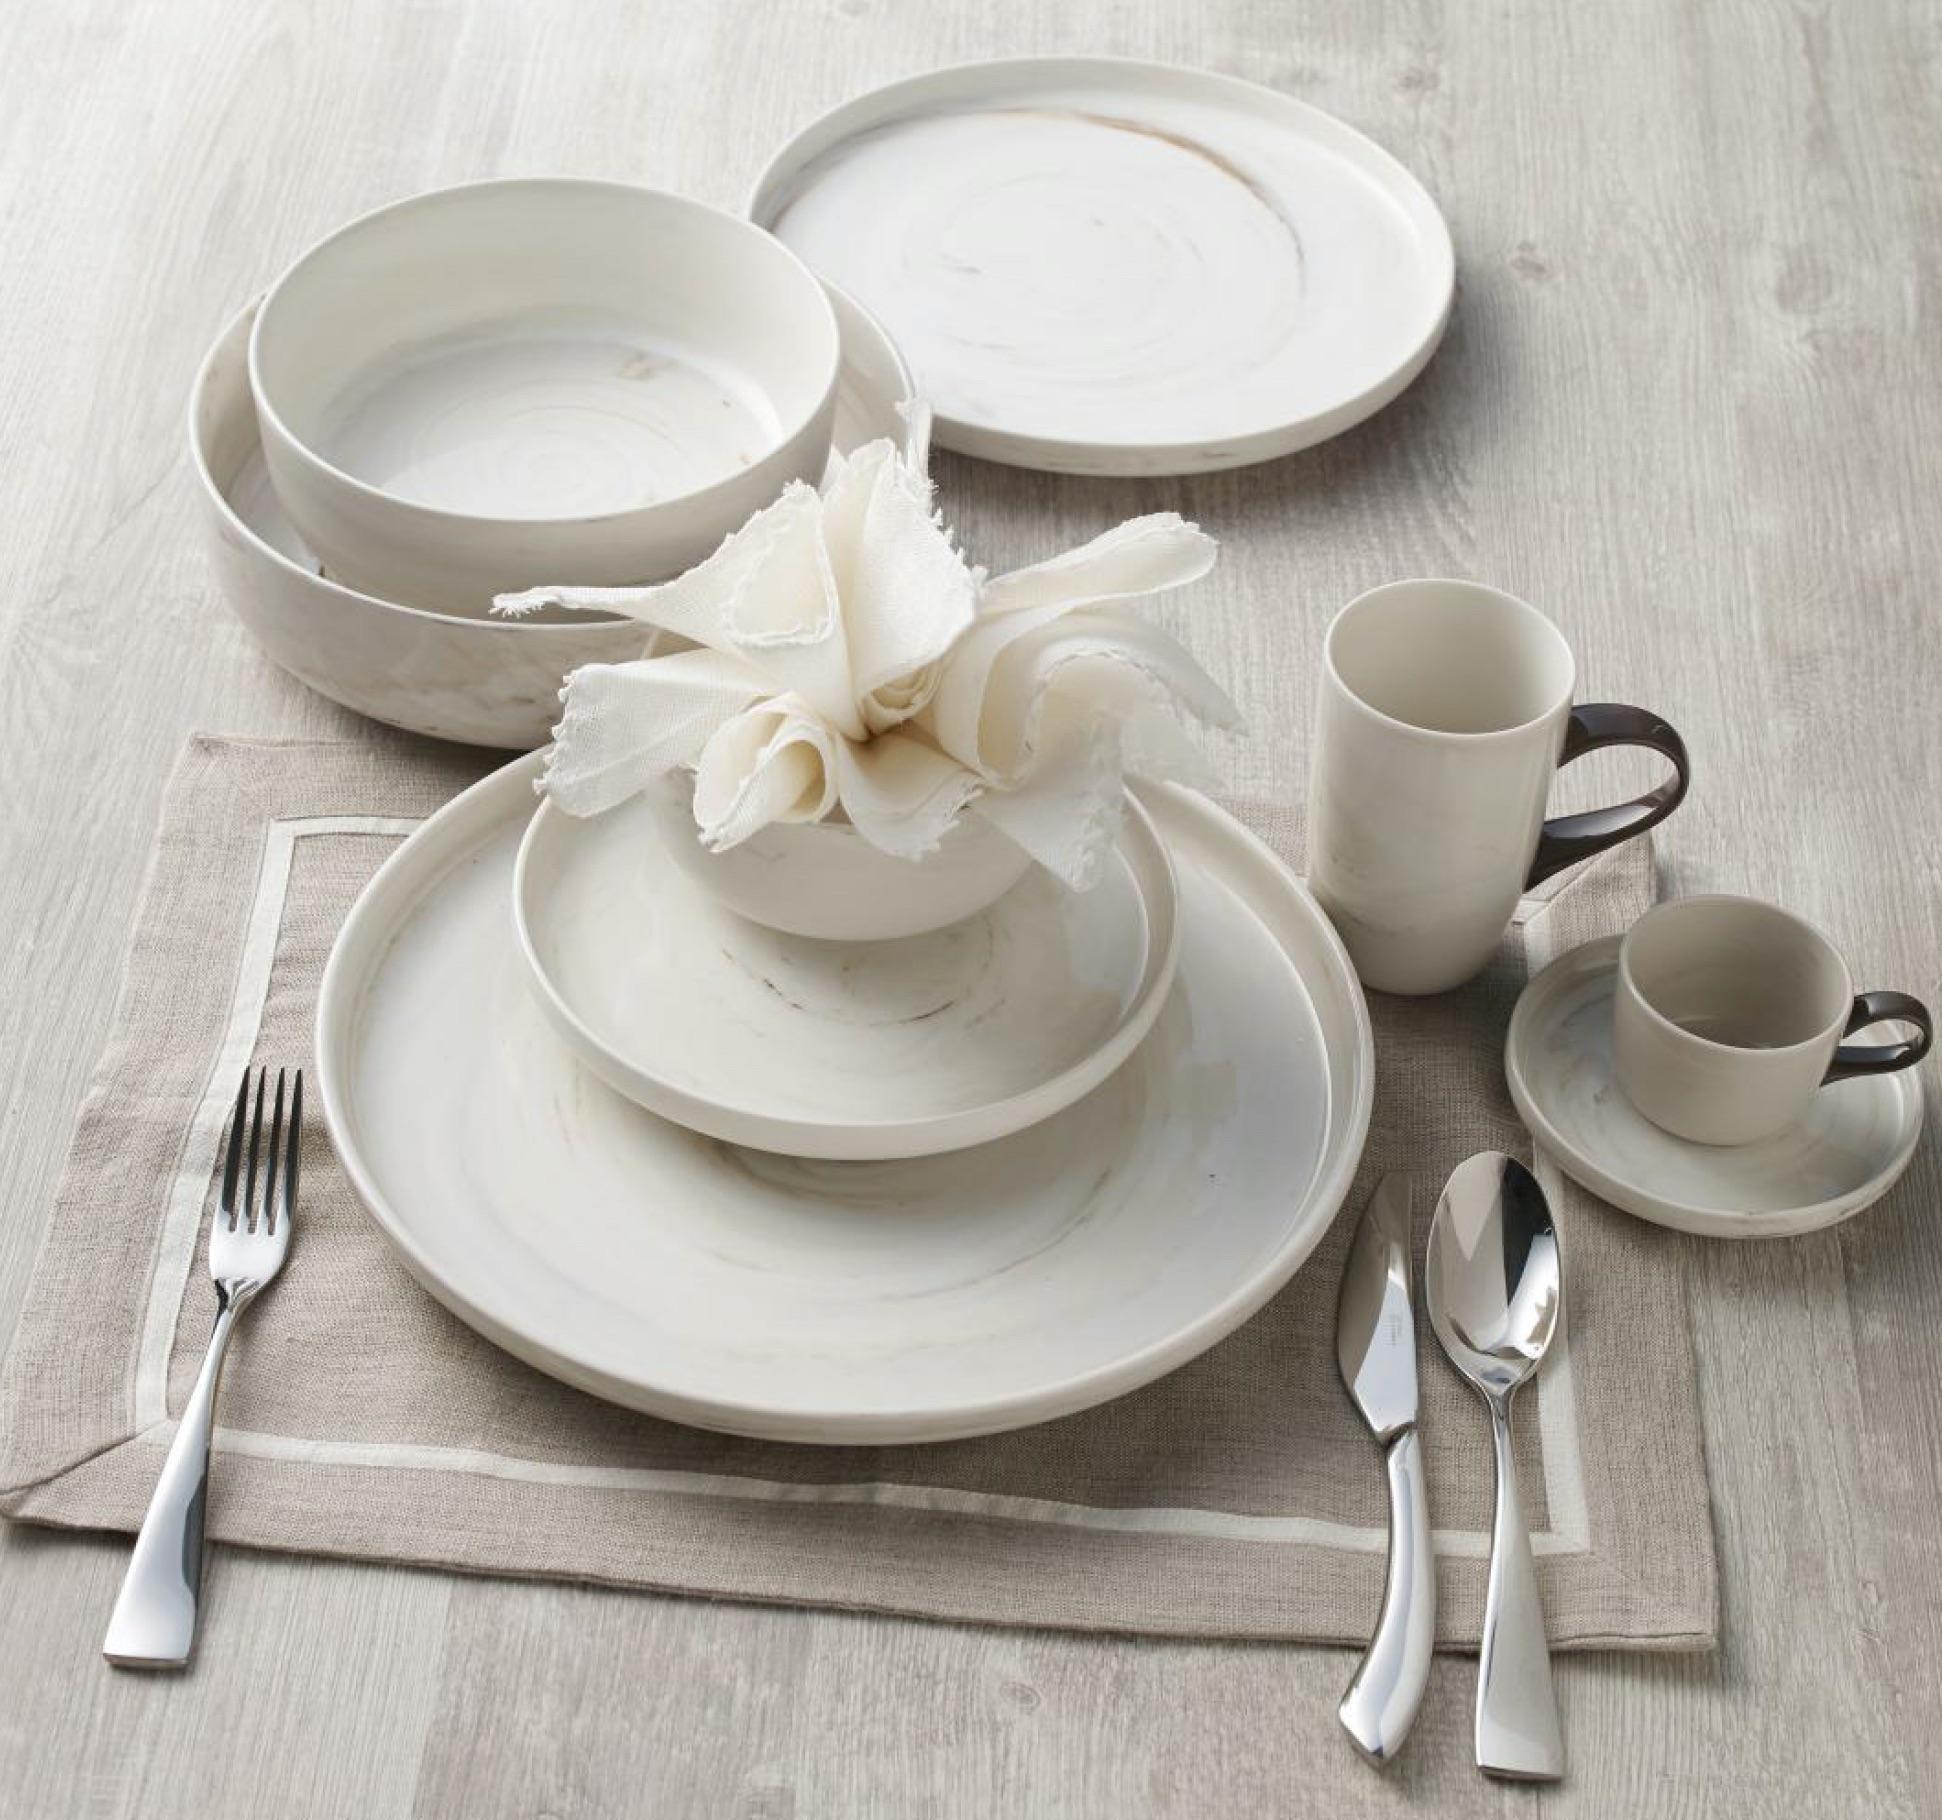 & Oneida is Bringing the Luzerne Dinnerware to the U.S.